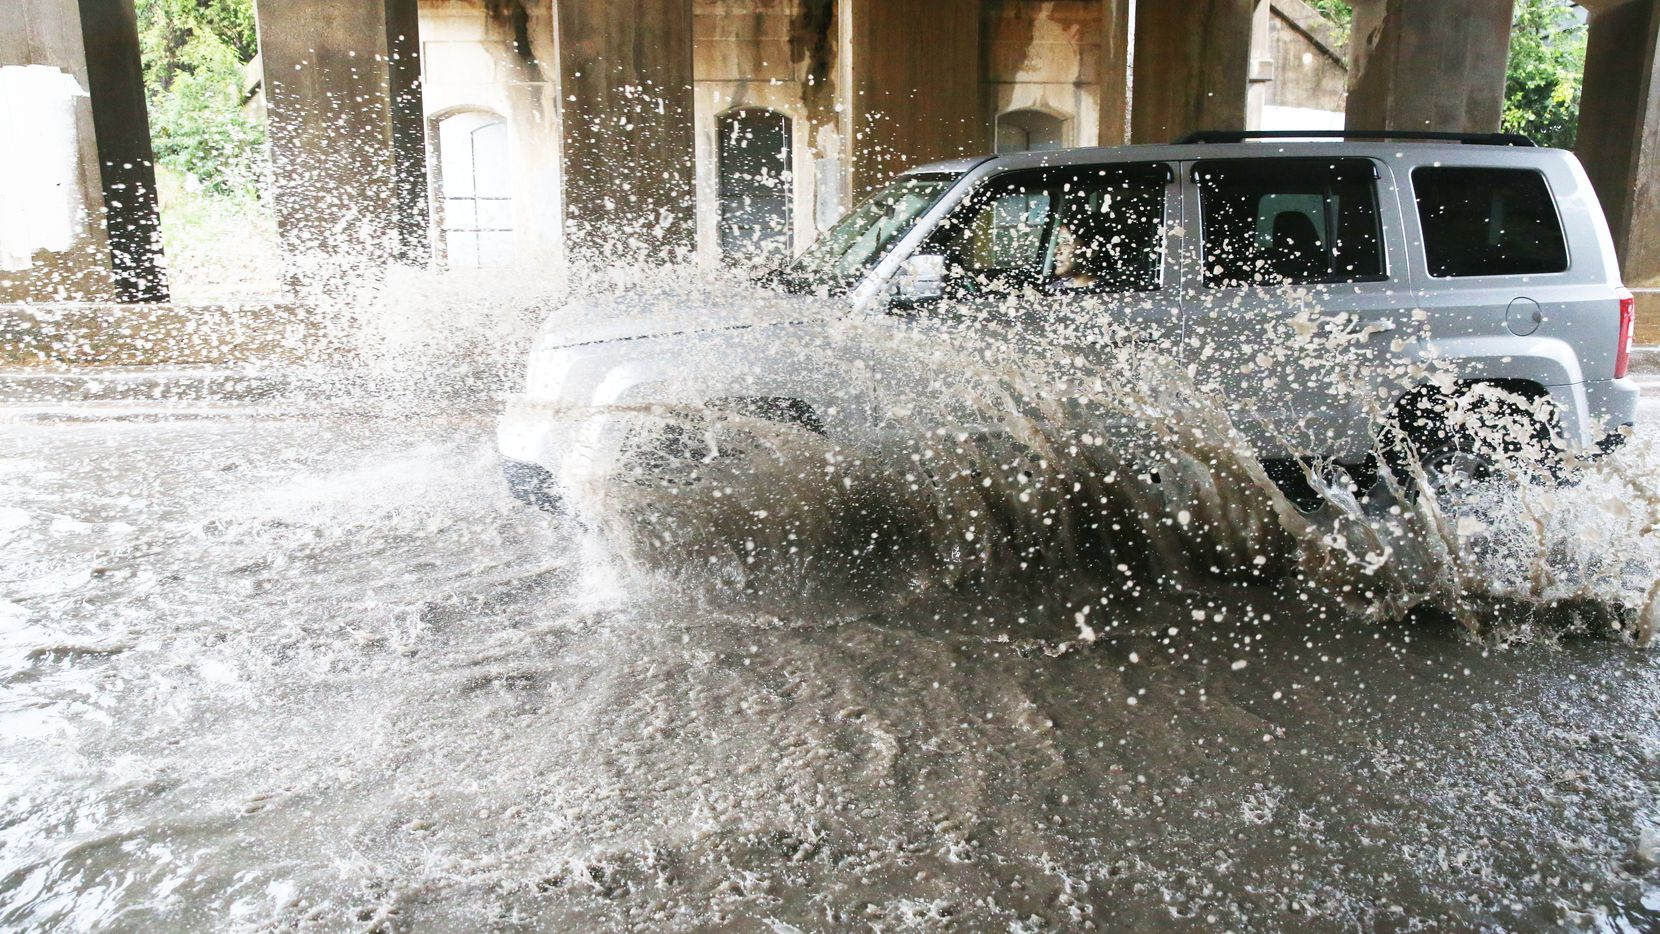 A car drives through standing water at 2400 Sylvan Ave.